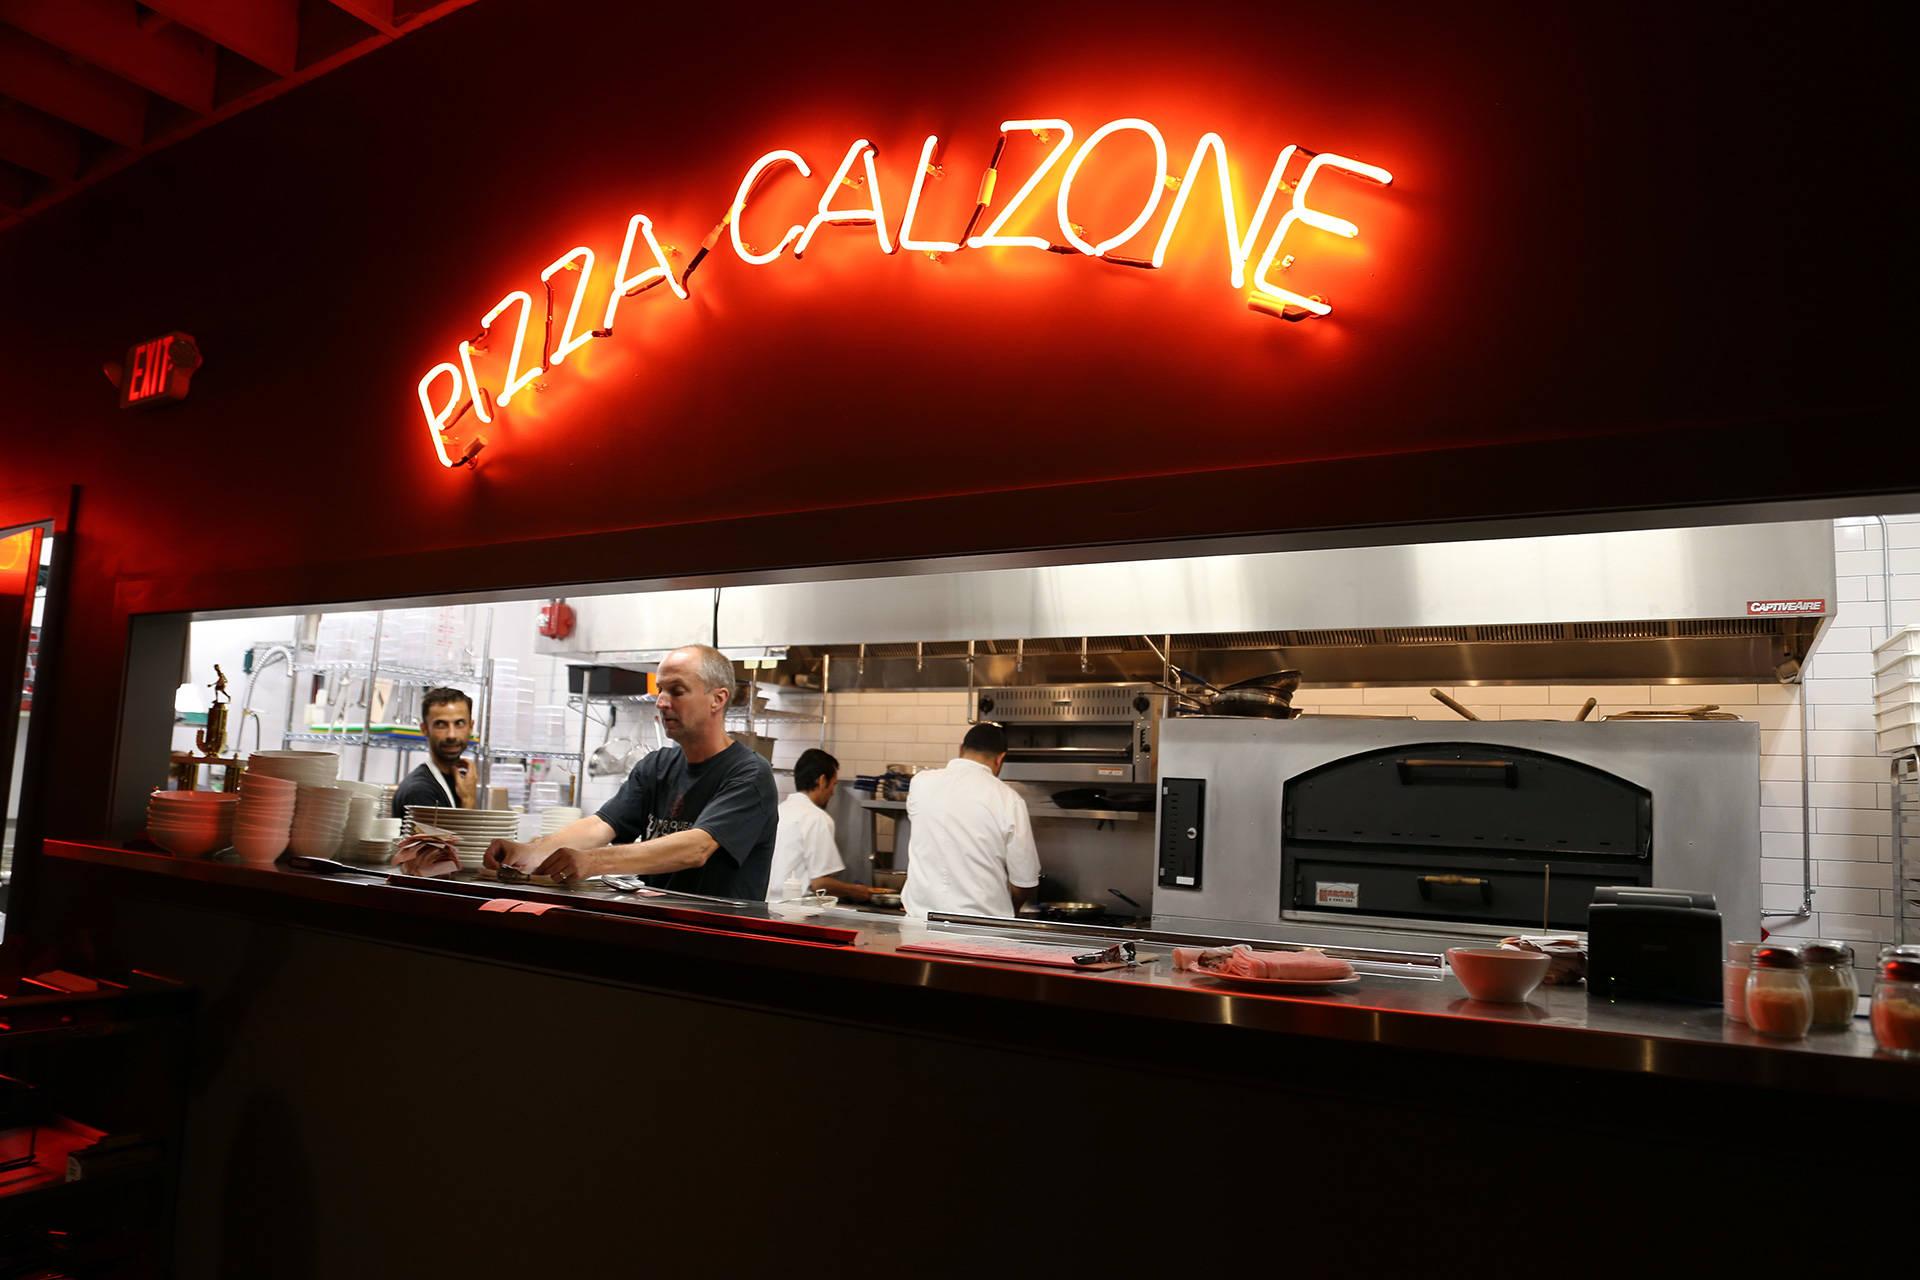 Gio's open kitchen with original Giovanni's neon signage.